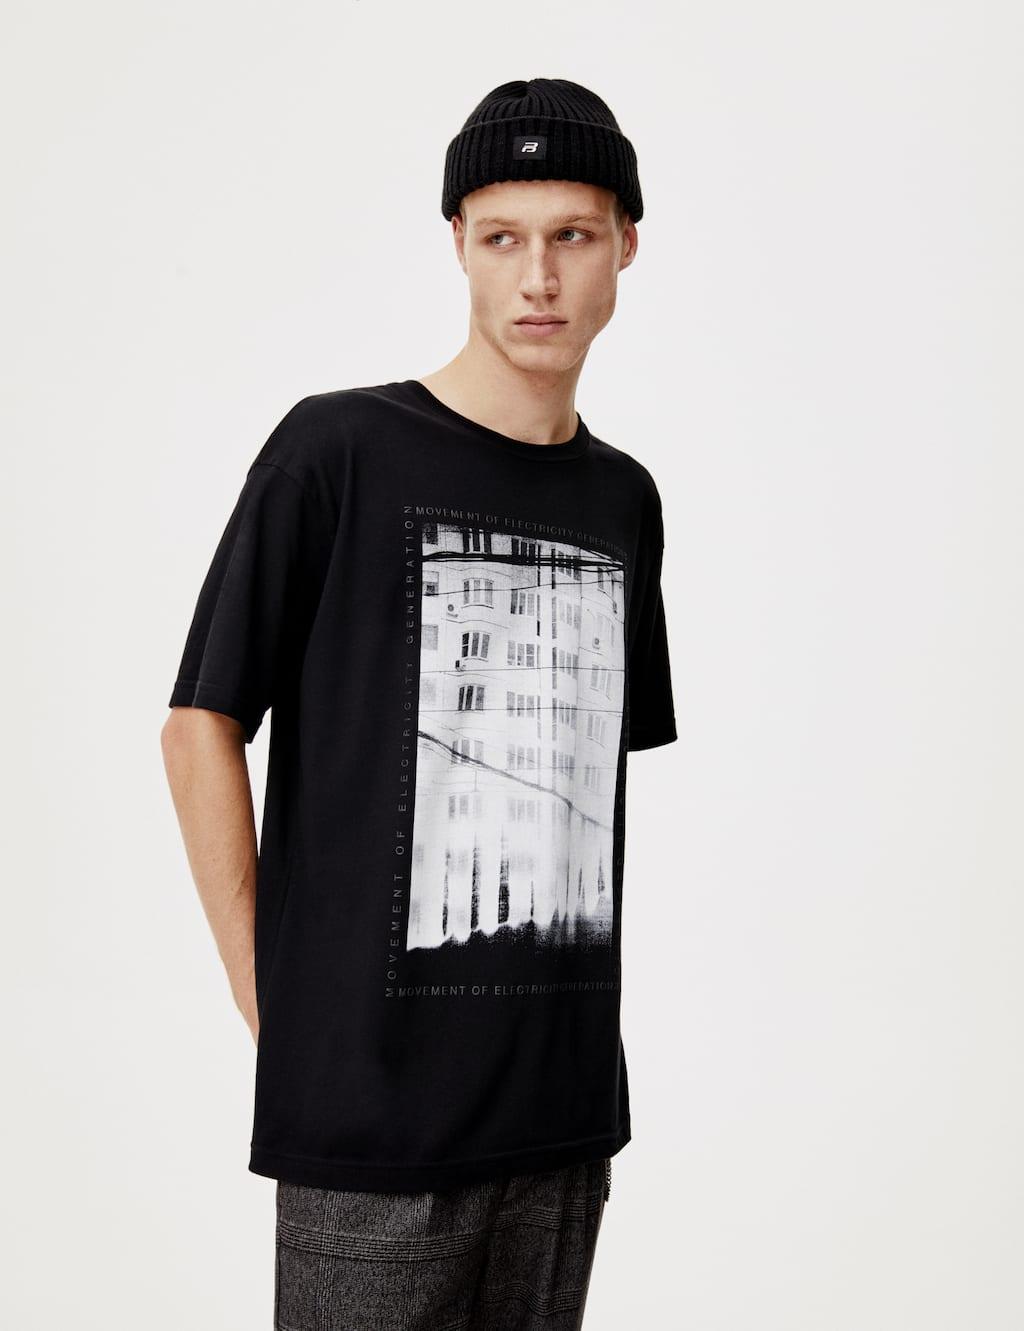 building-illustration-t-shirt by pull-&-bear